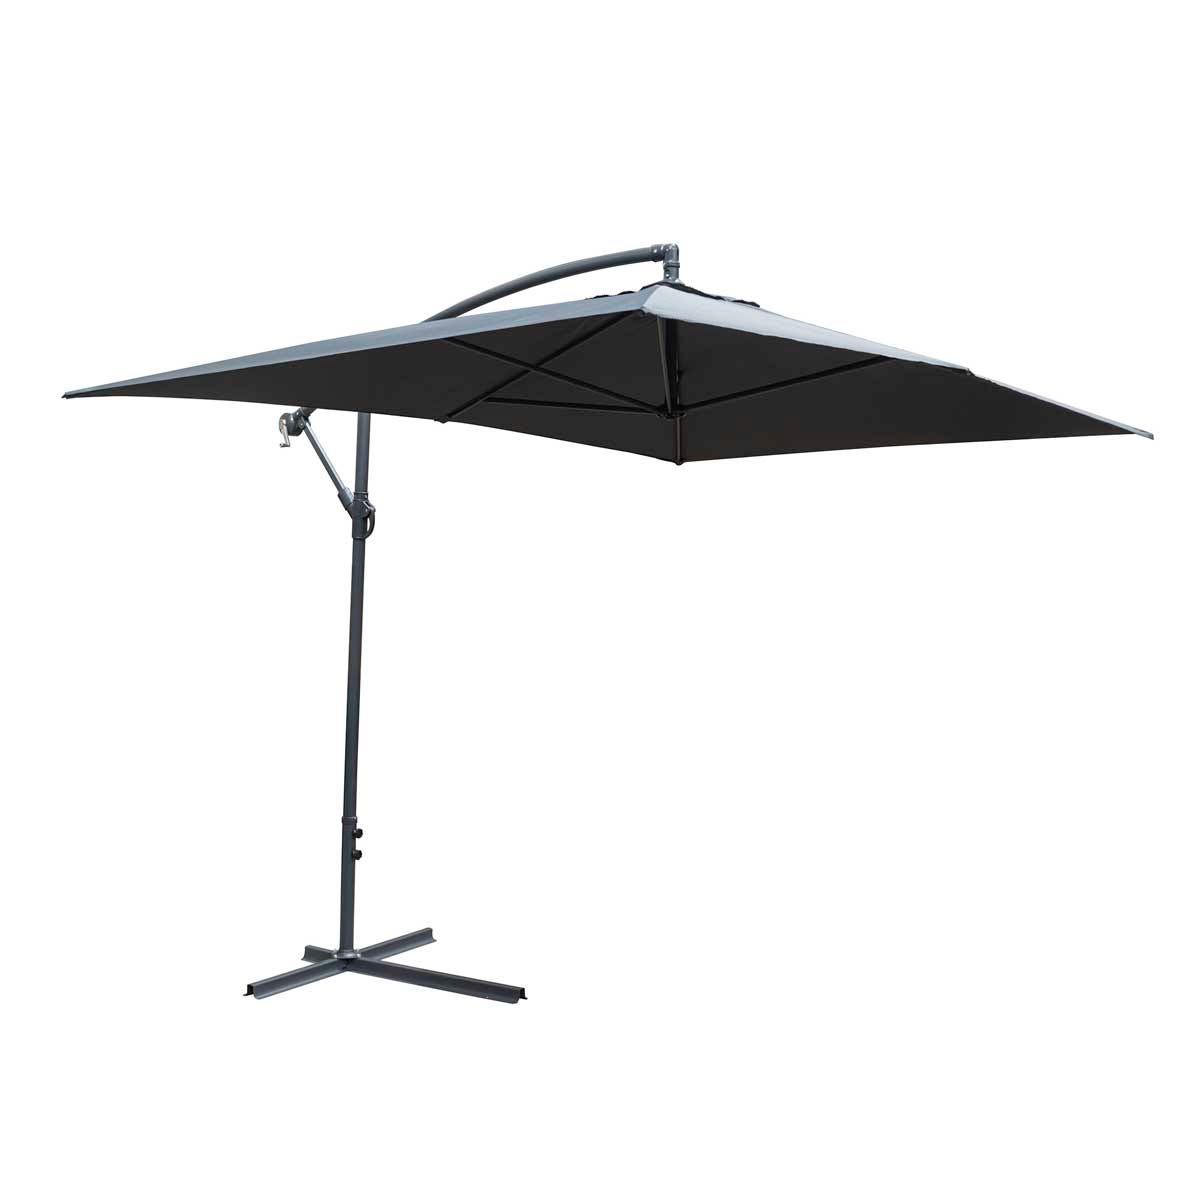 Rowlinson Prestbury Rectangular Overhang Parasol (base not included) - Grey